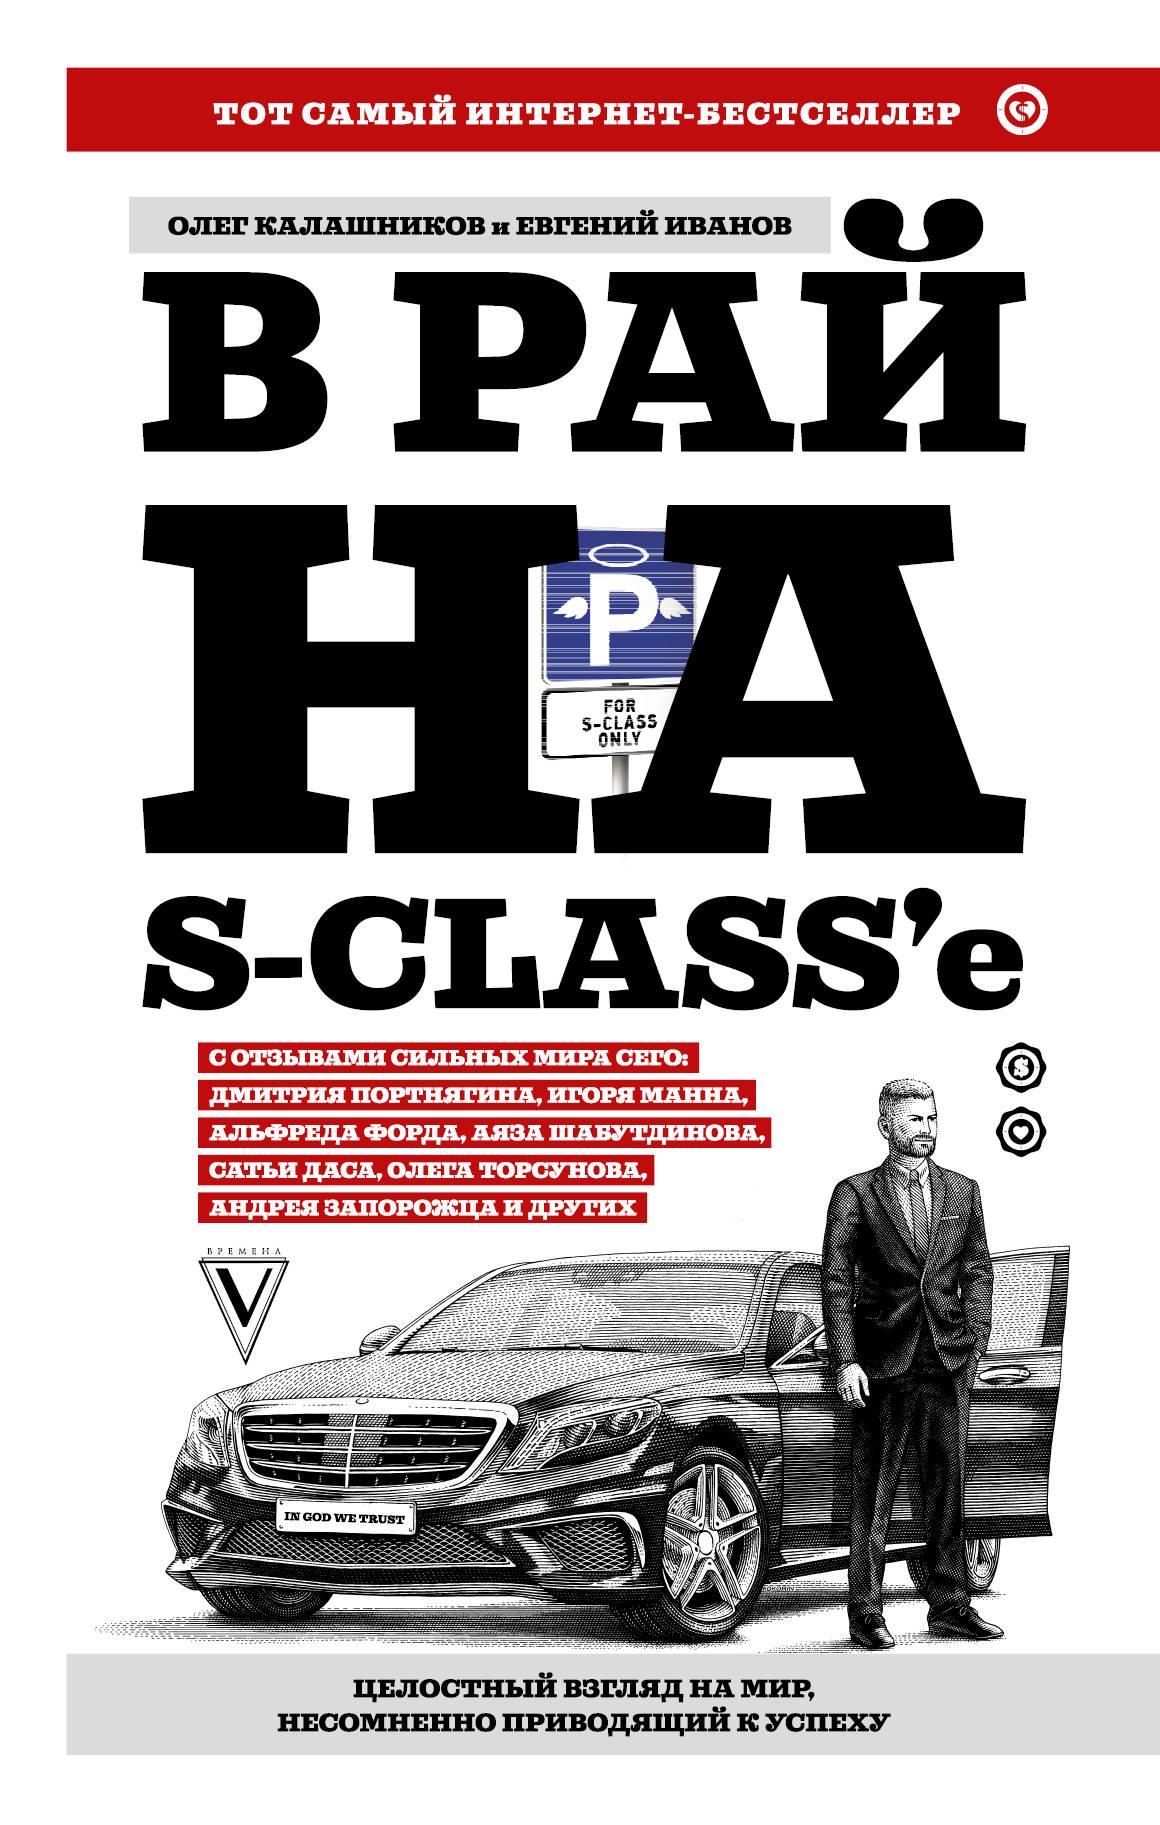 В рай на S-class'е - Олег Калашников